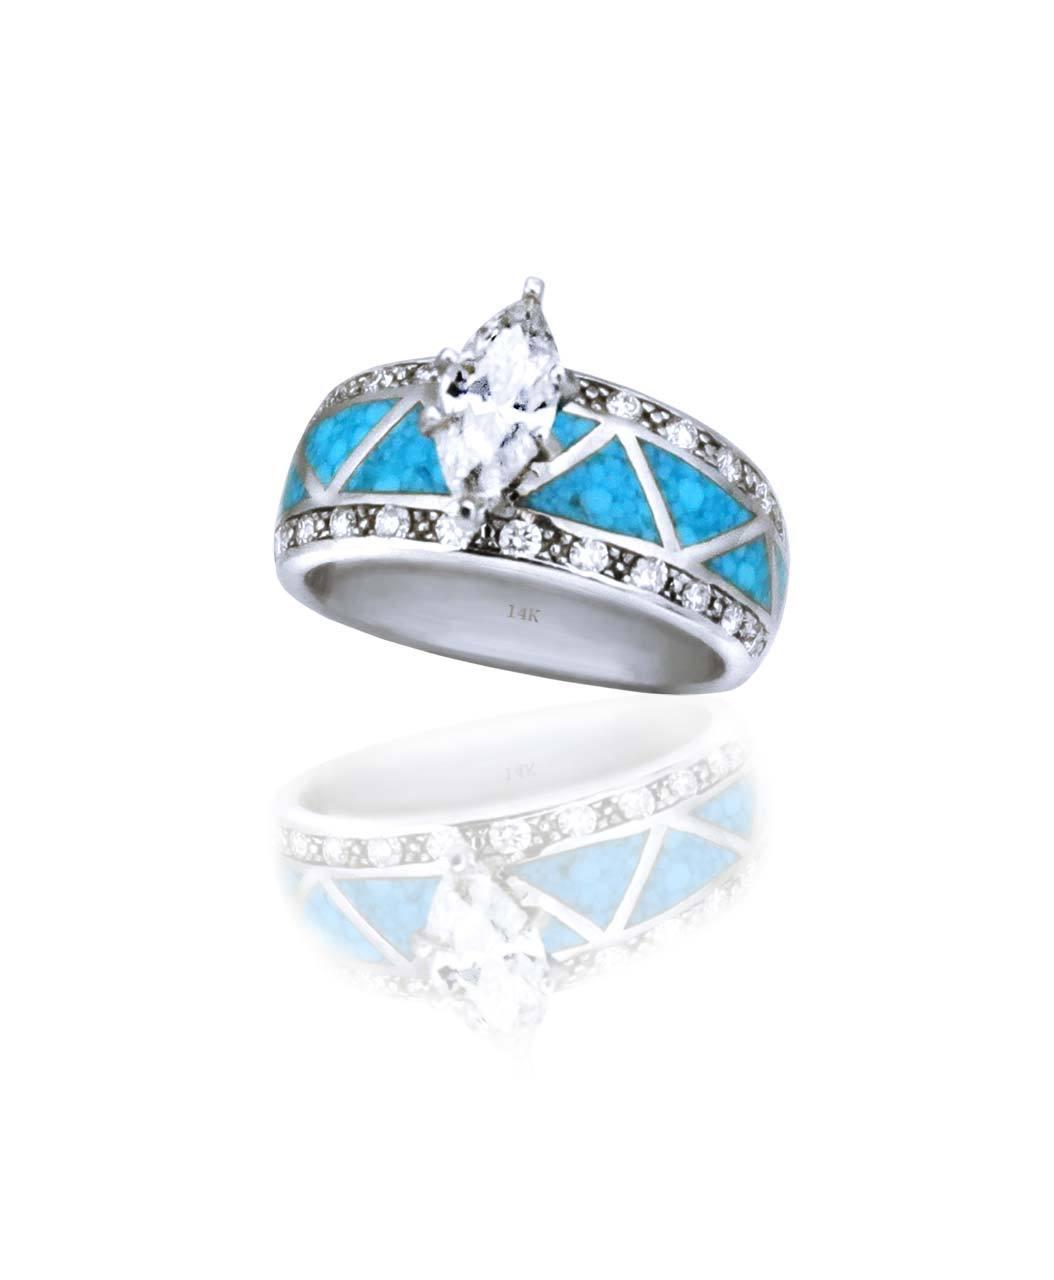 Maverick S 14k White Gold Turquoise Inlay Marquise Diamond Wedding